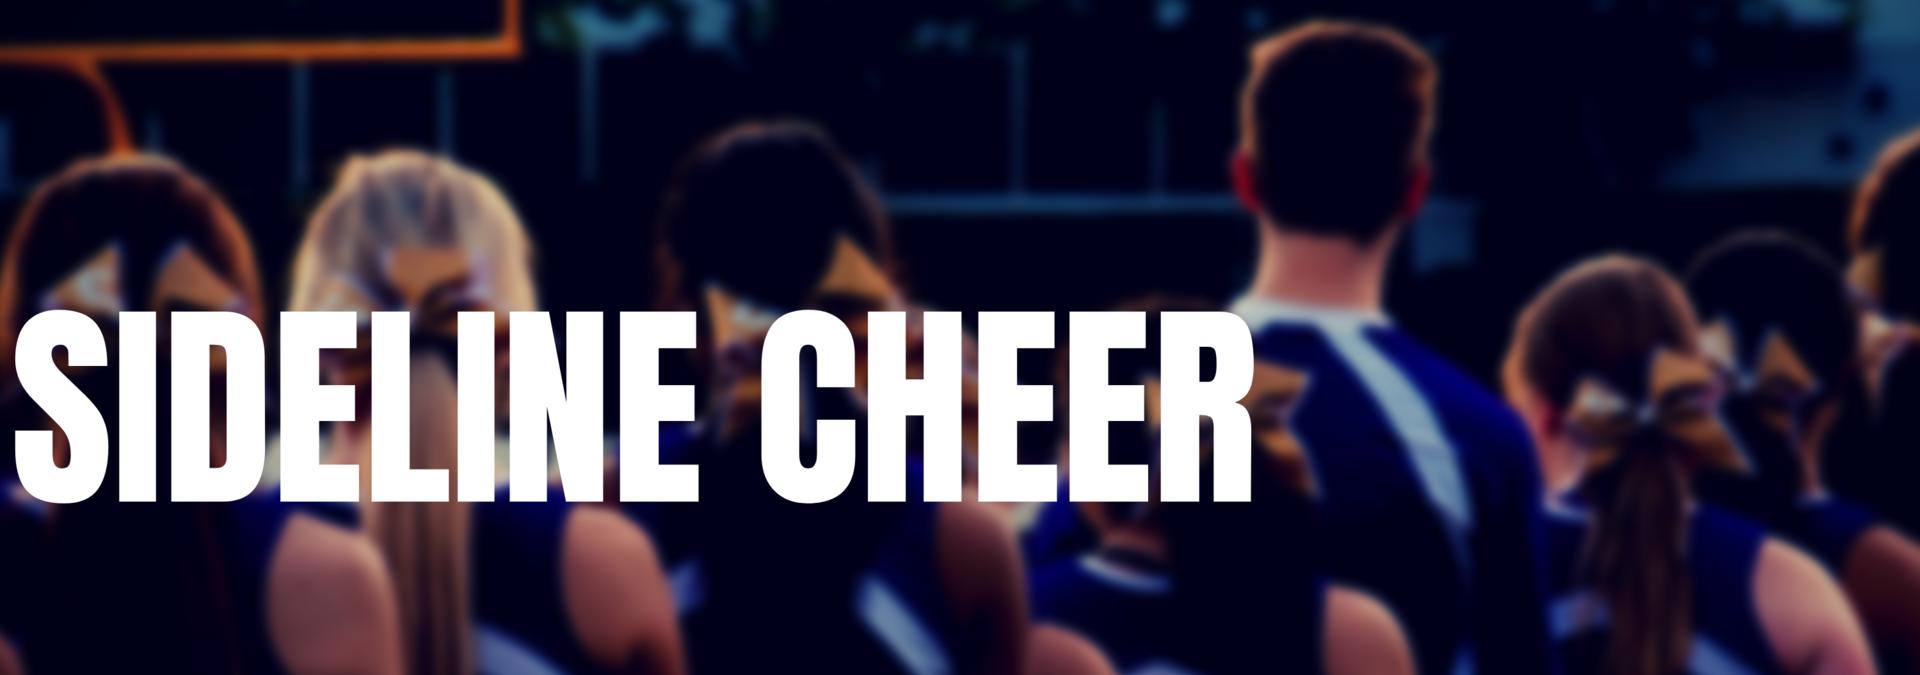 sideline cheer